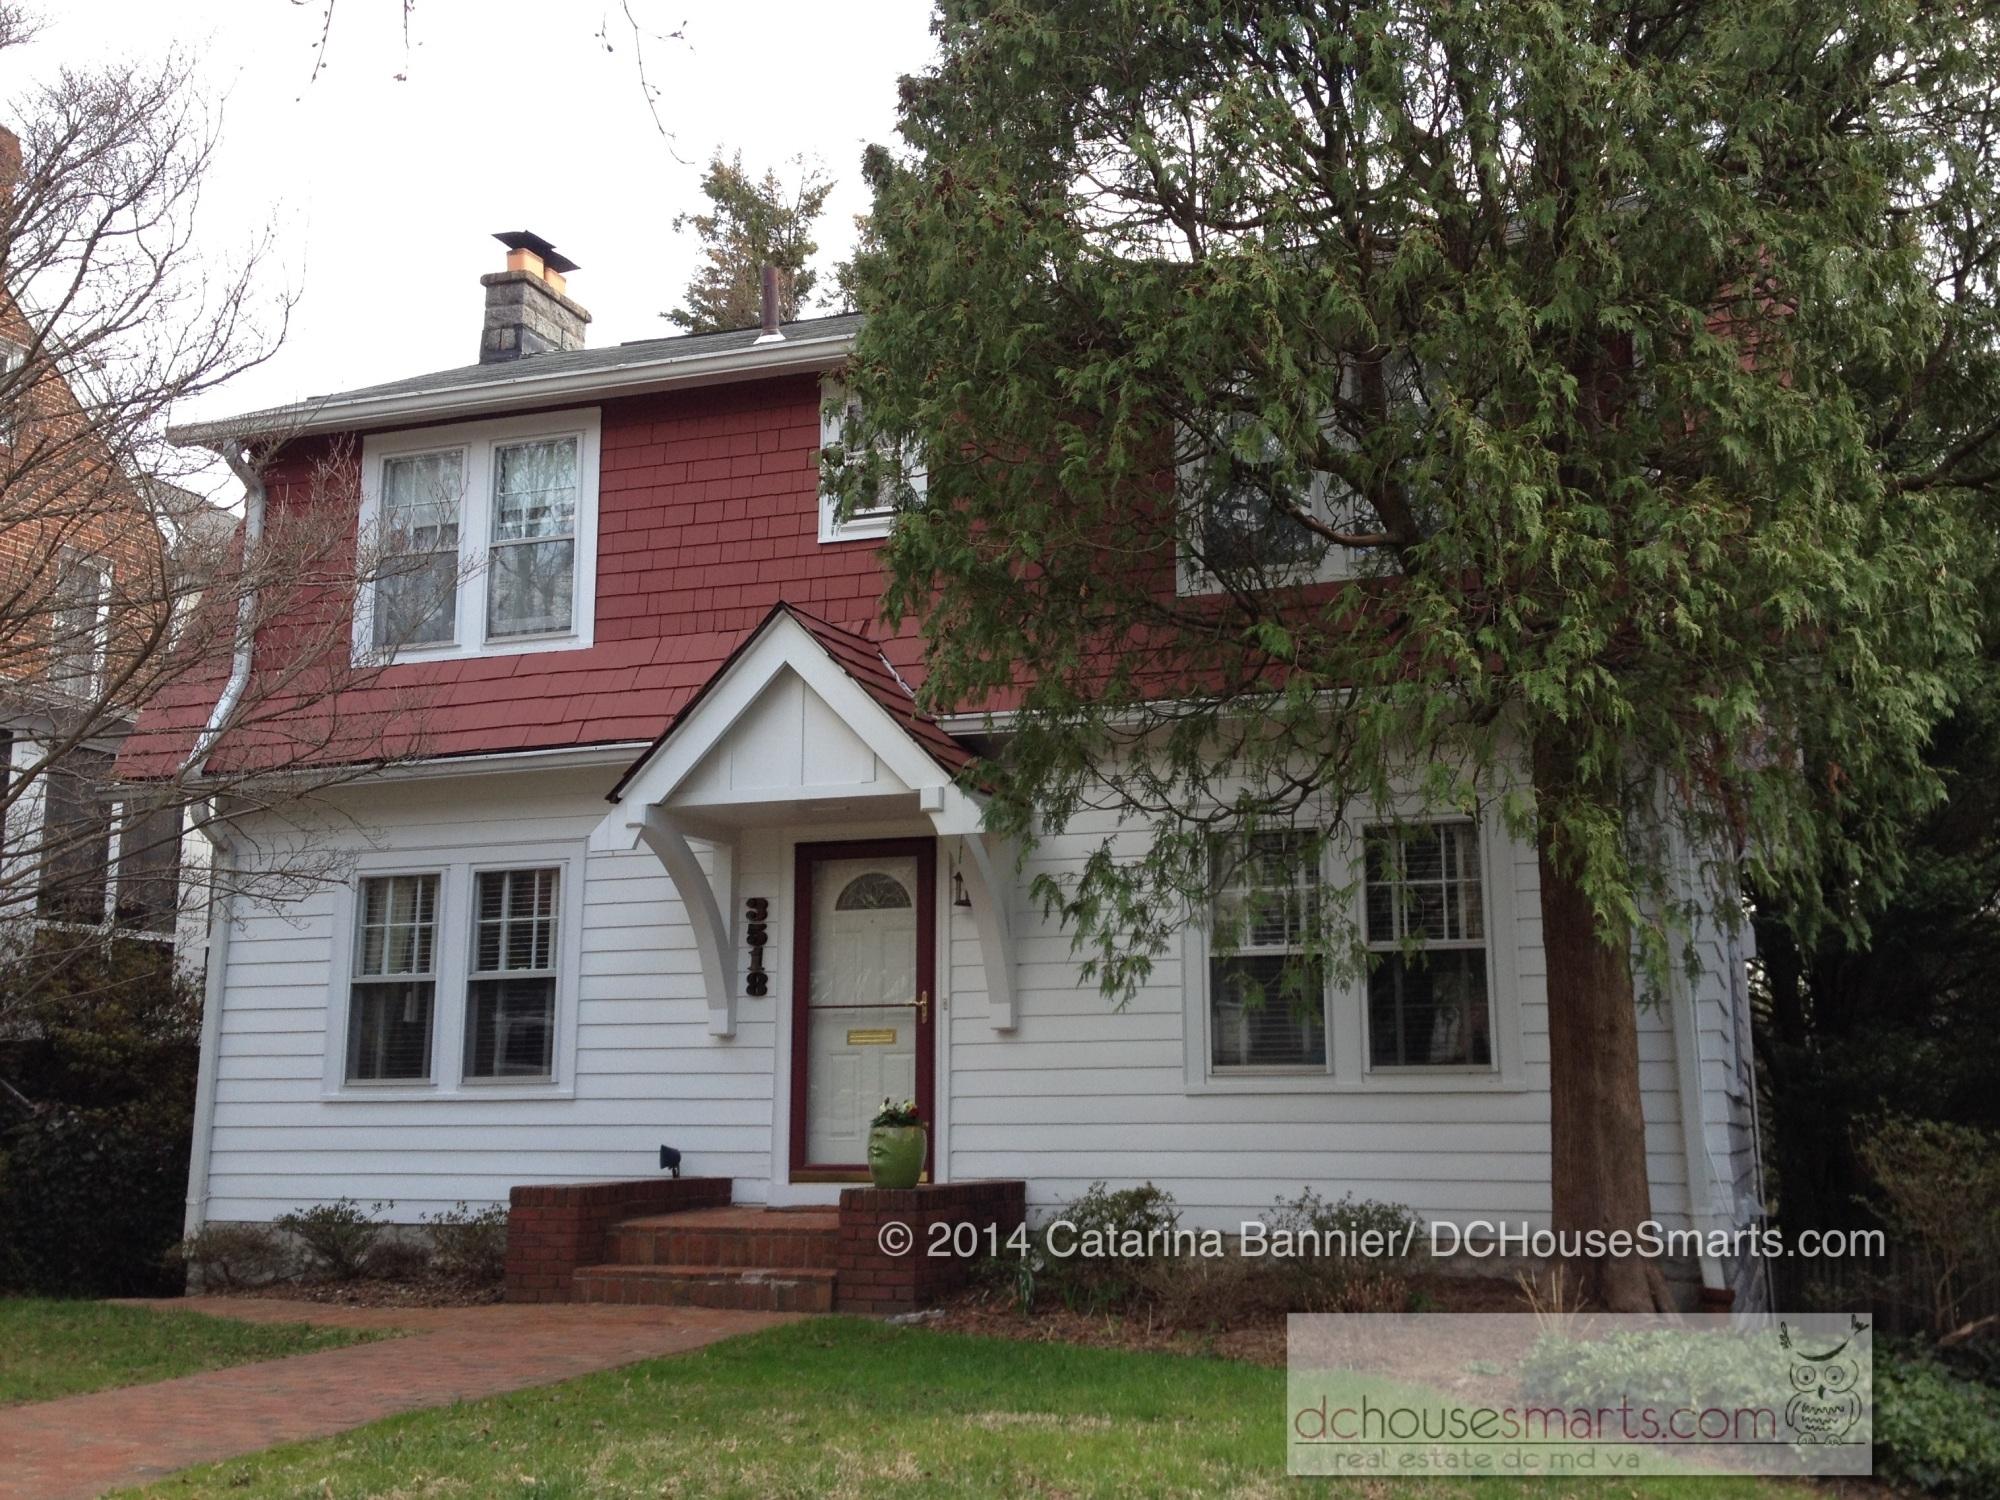 Washington DC Mail-order homes